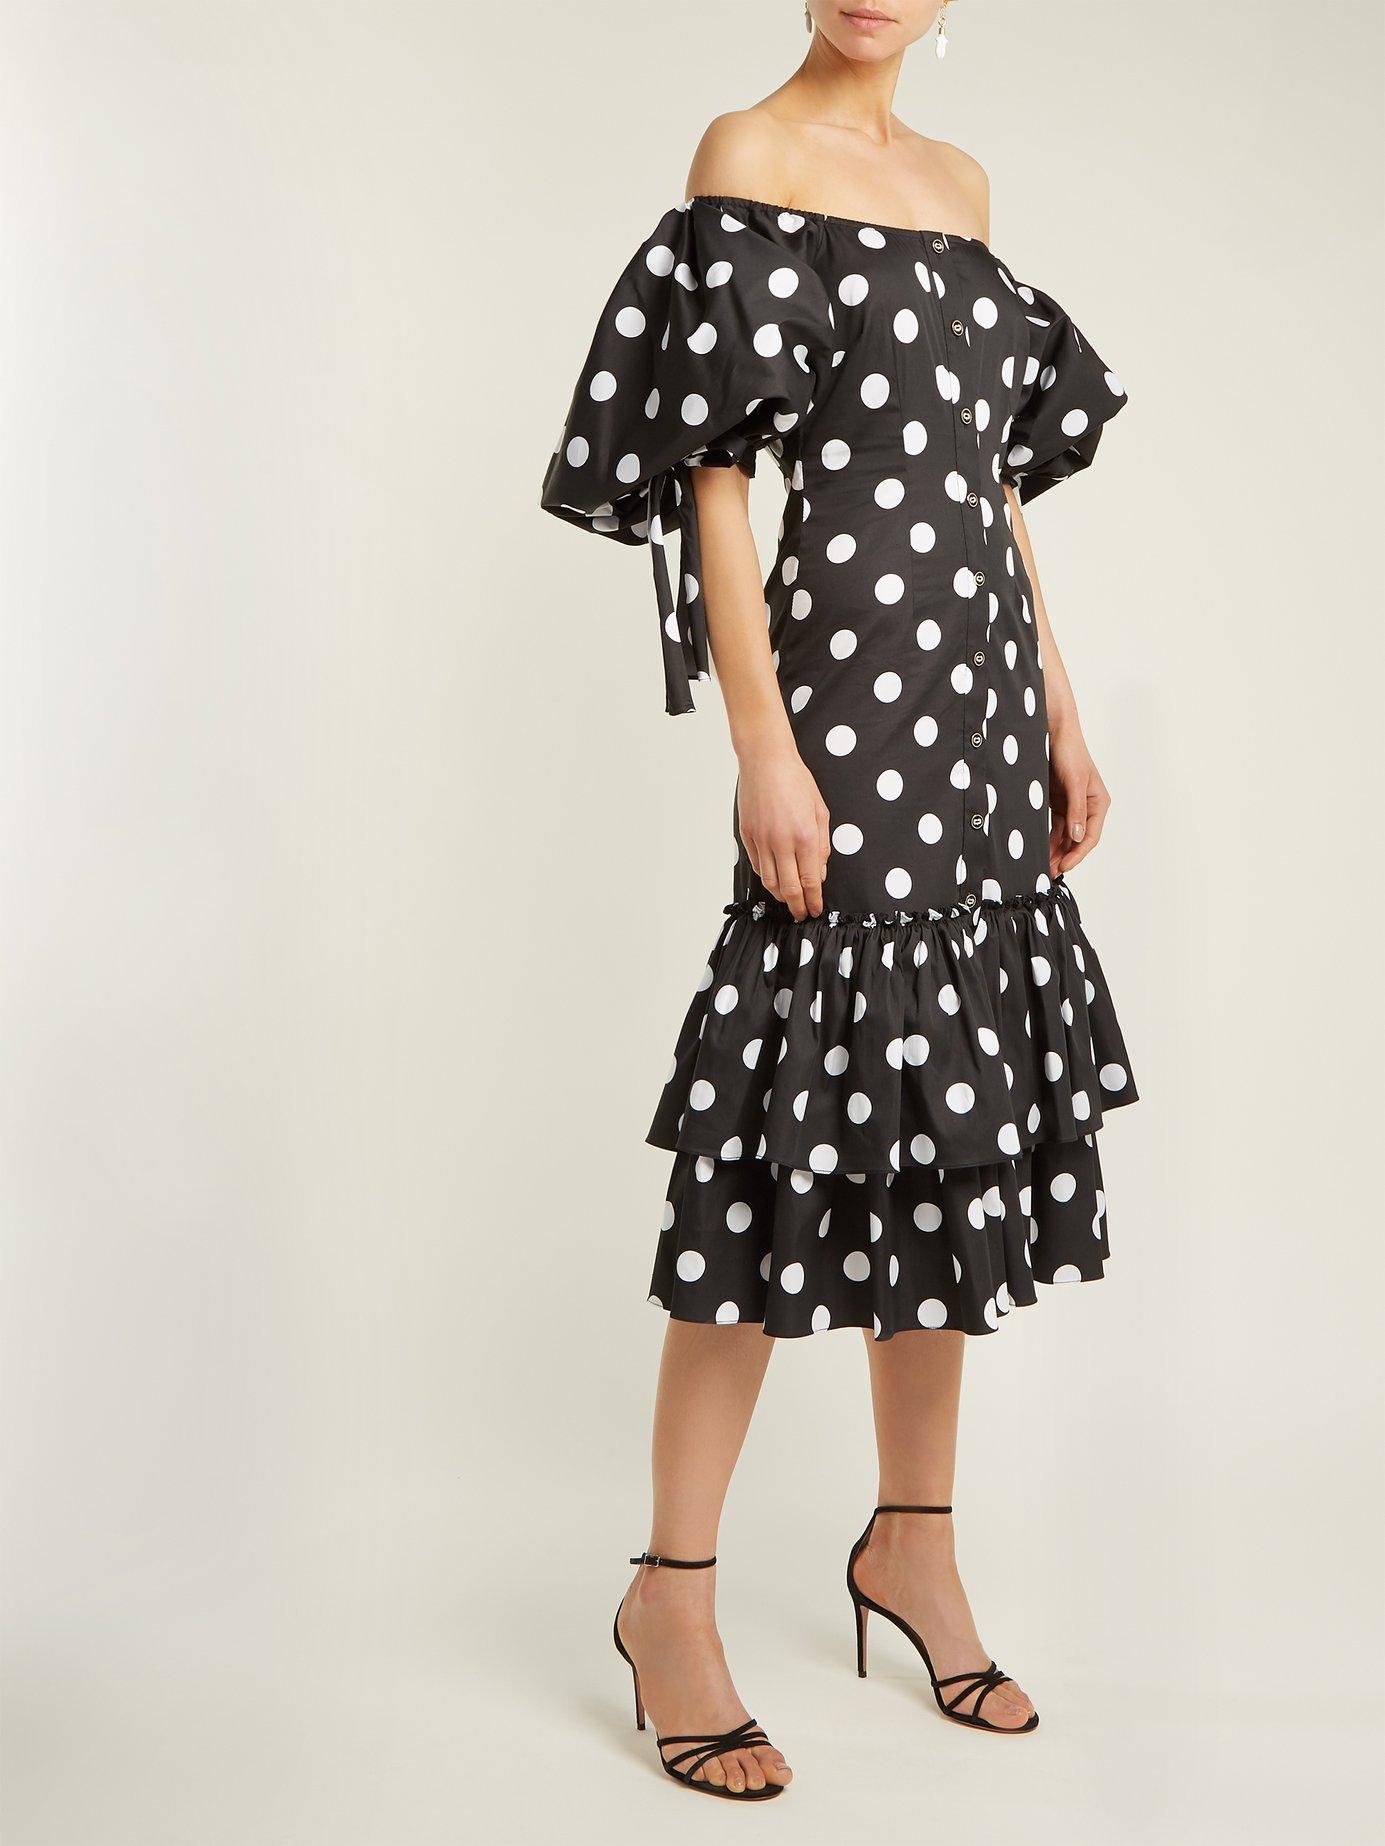 Nella off-the-shoulder polka-dot dress by Caroline Constas